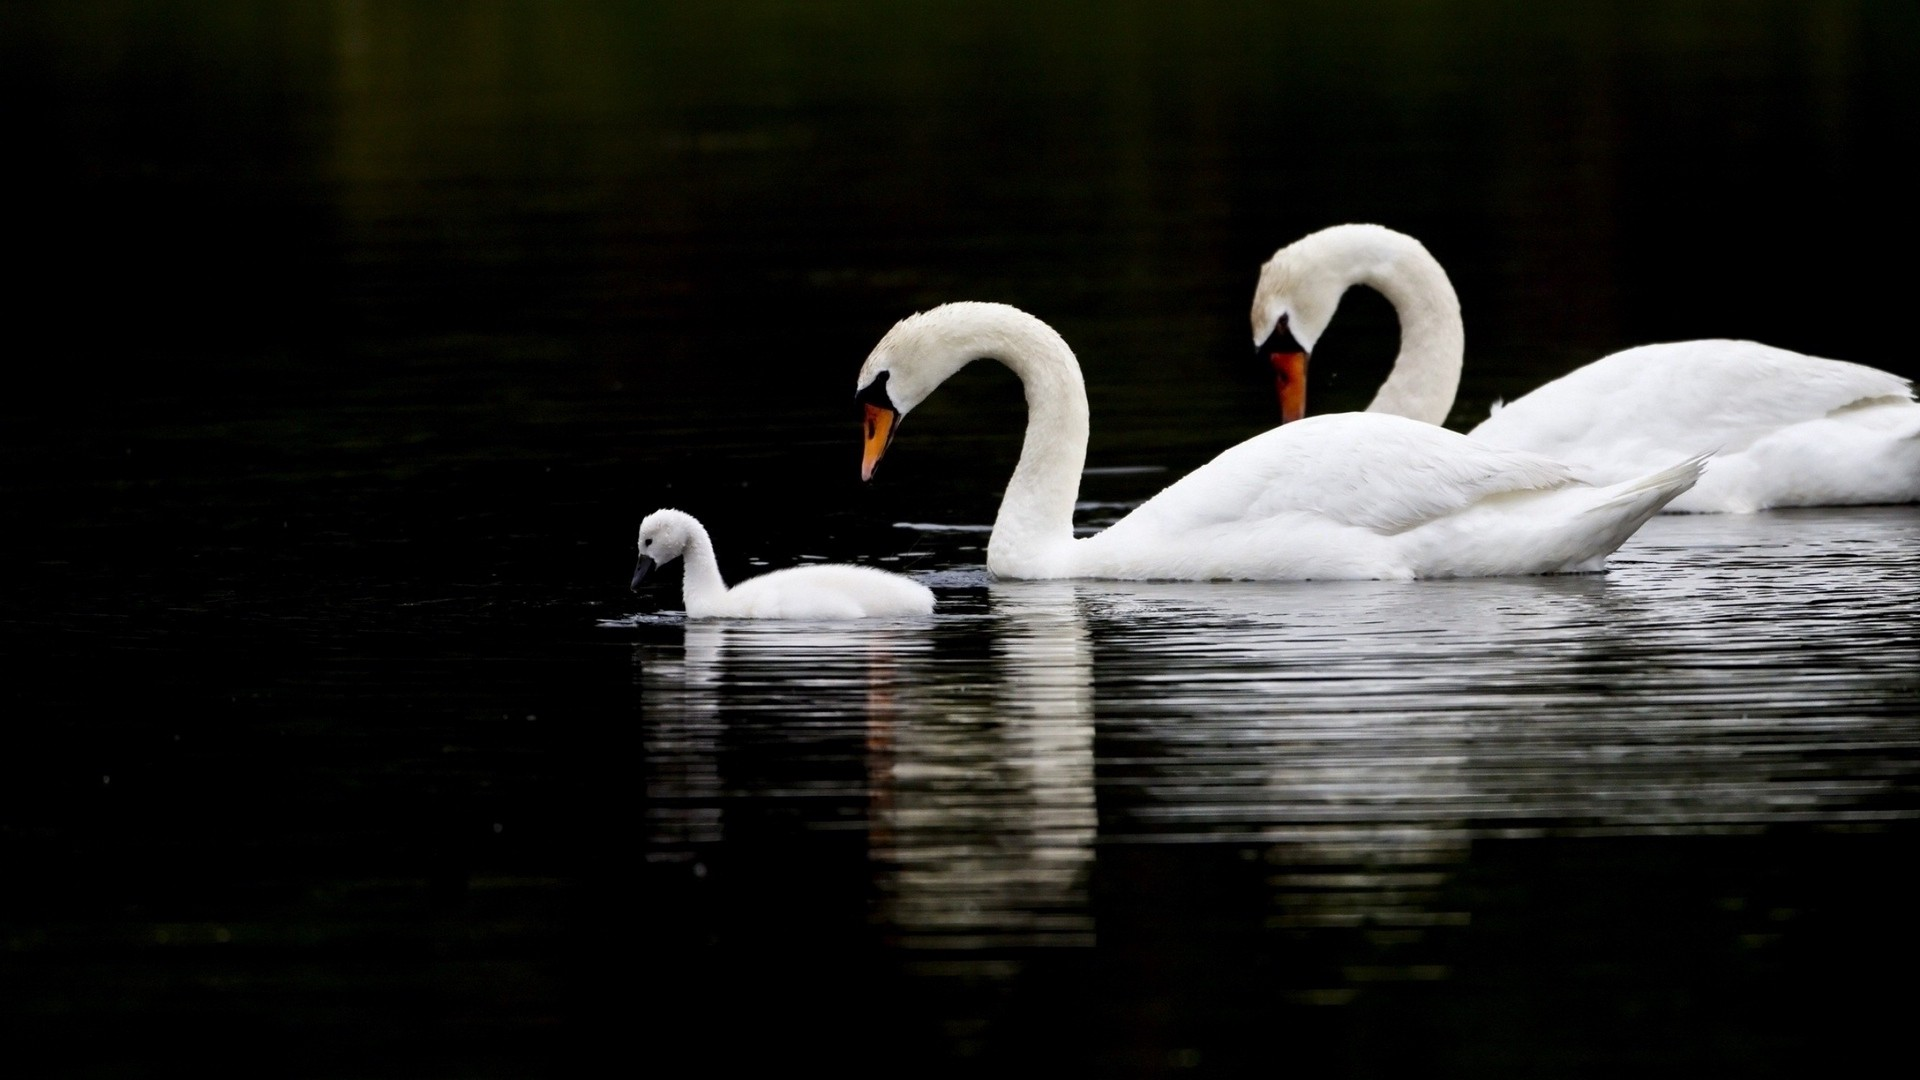 Swan desktop wallpaper download